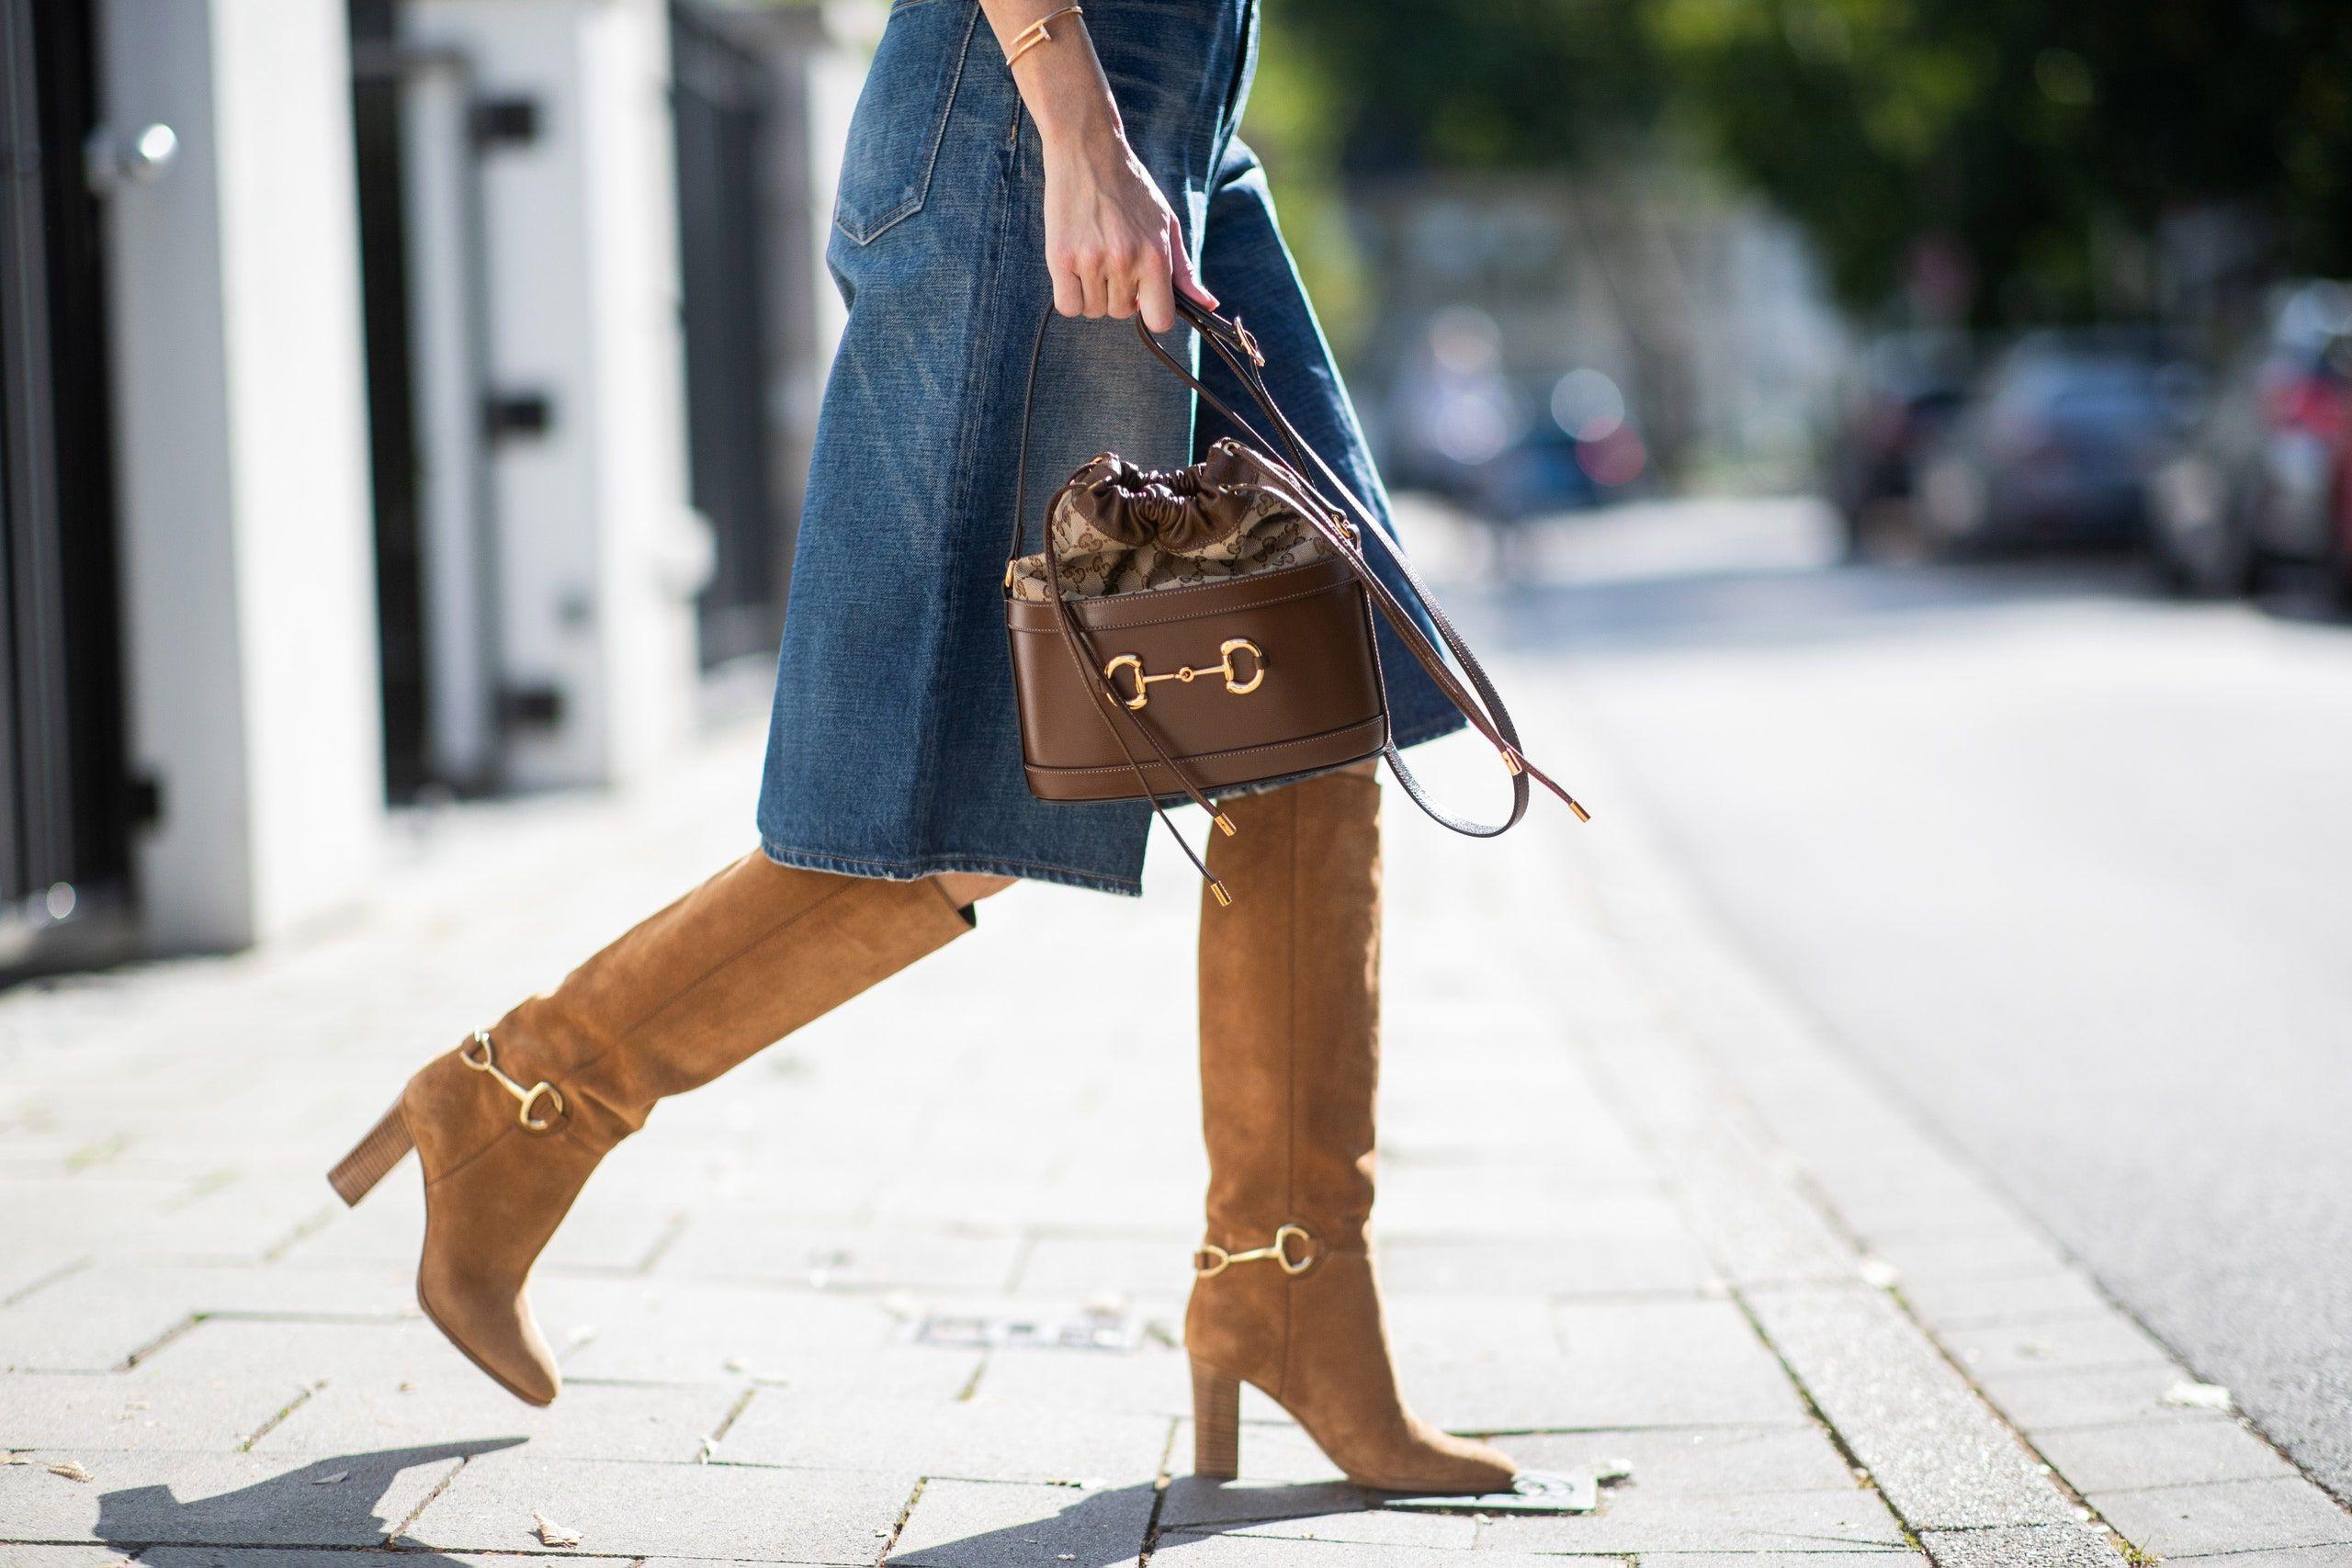 Deretan Fashion Item yang Wajib Kamu Hindari Saat Musim Hujan